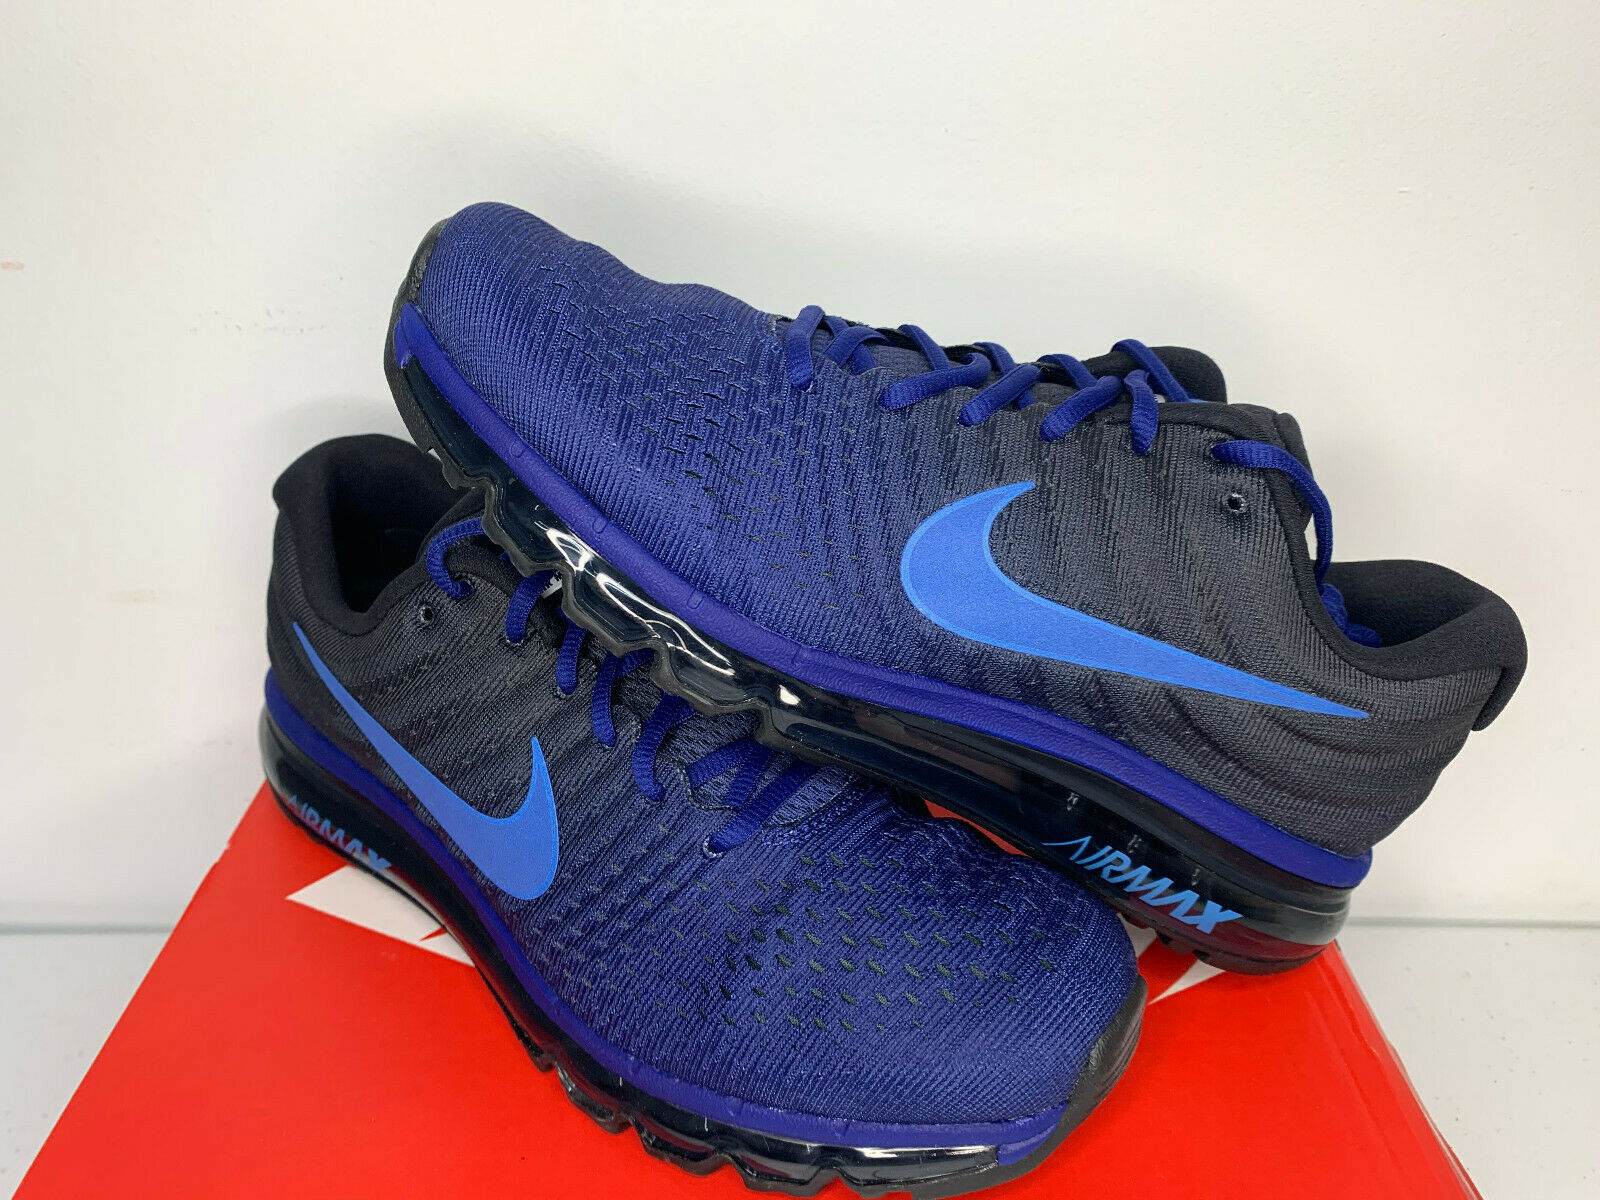 NIB Size 8-13 Nike Air Max 2017 Blue Hyper Cobalt Running Shoes Training TR  NEW